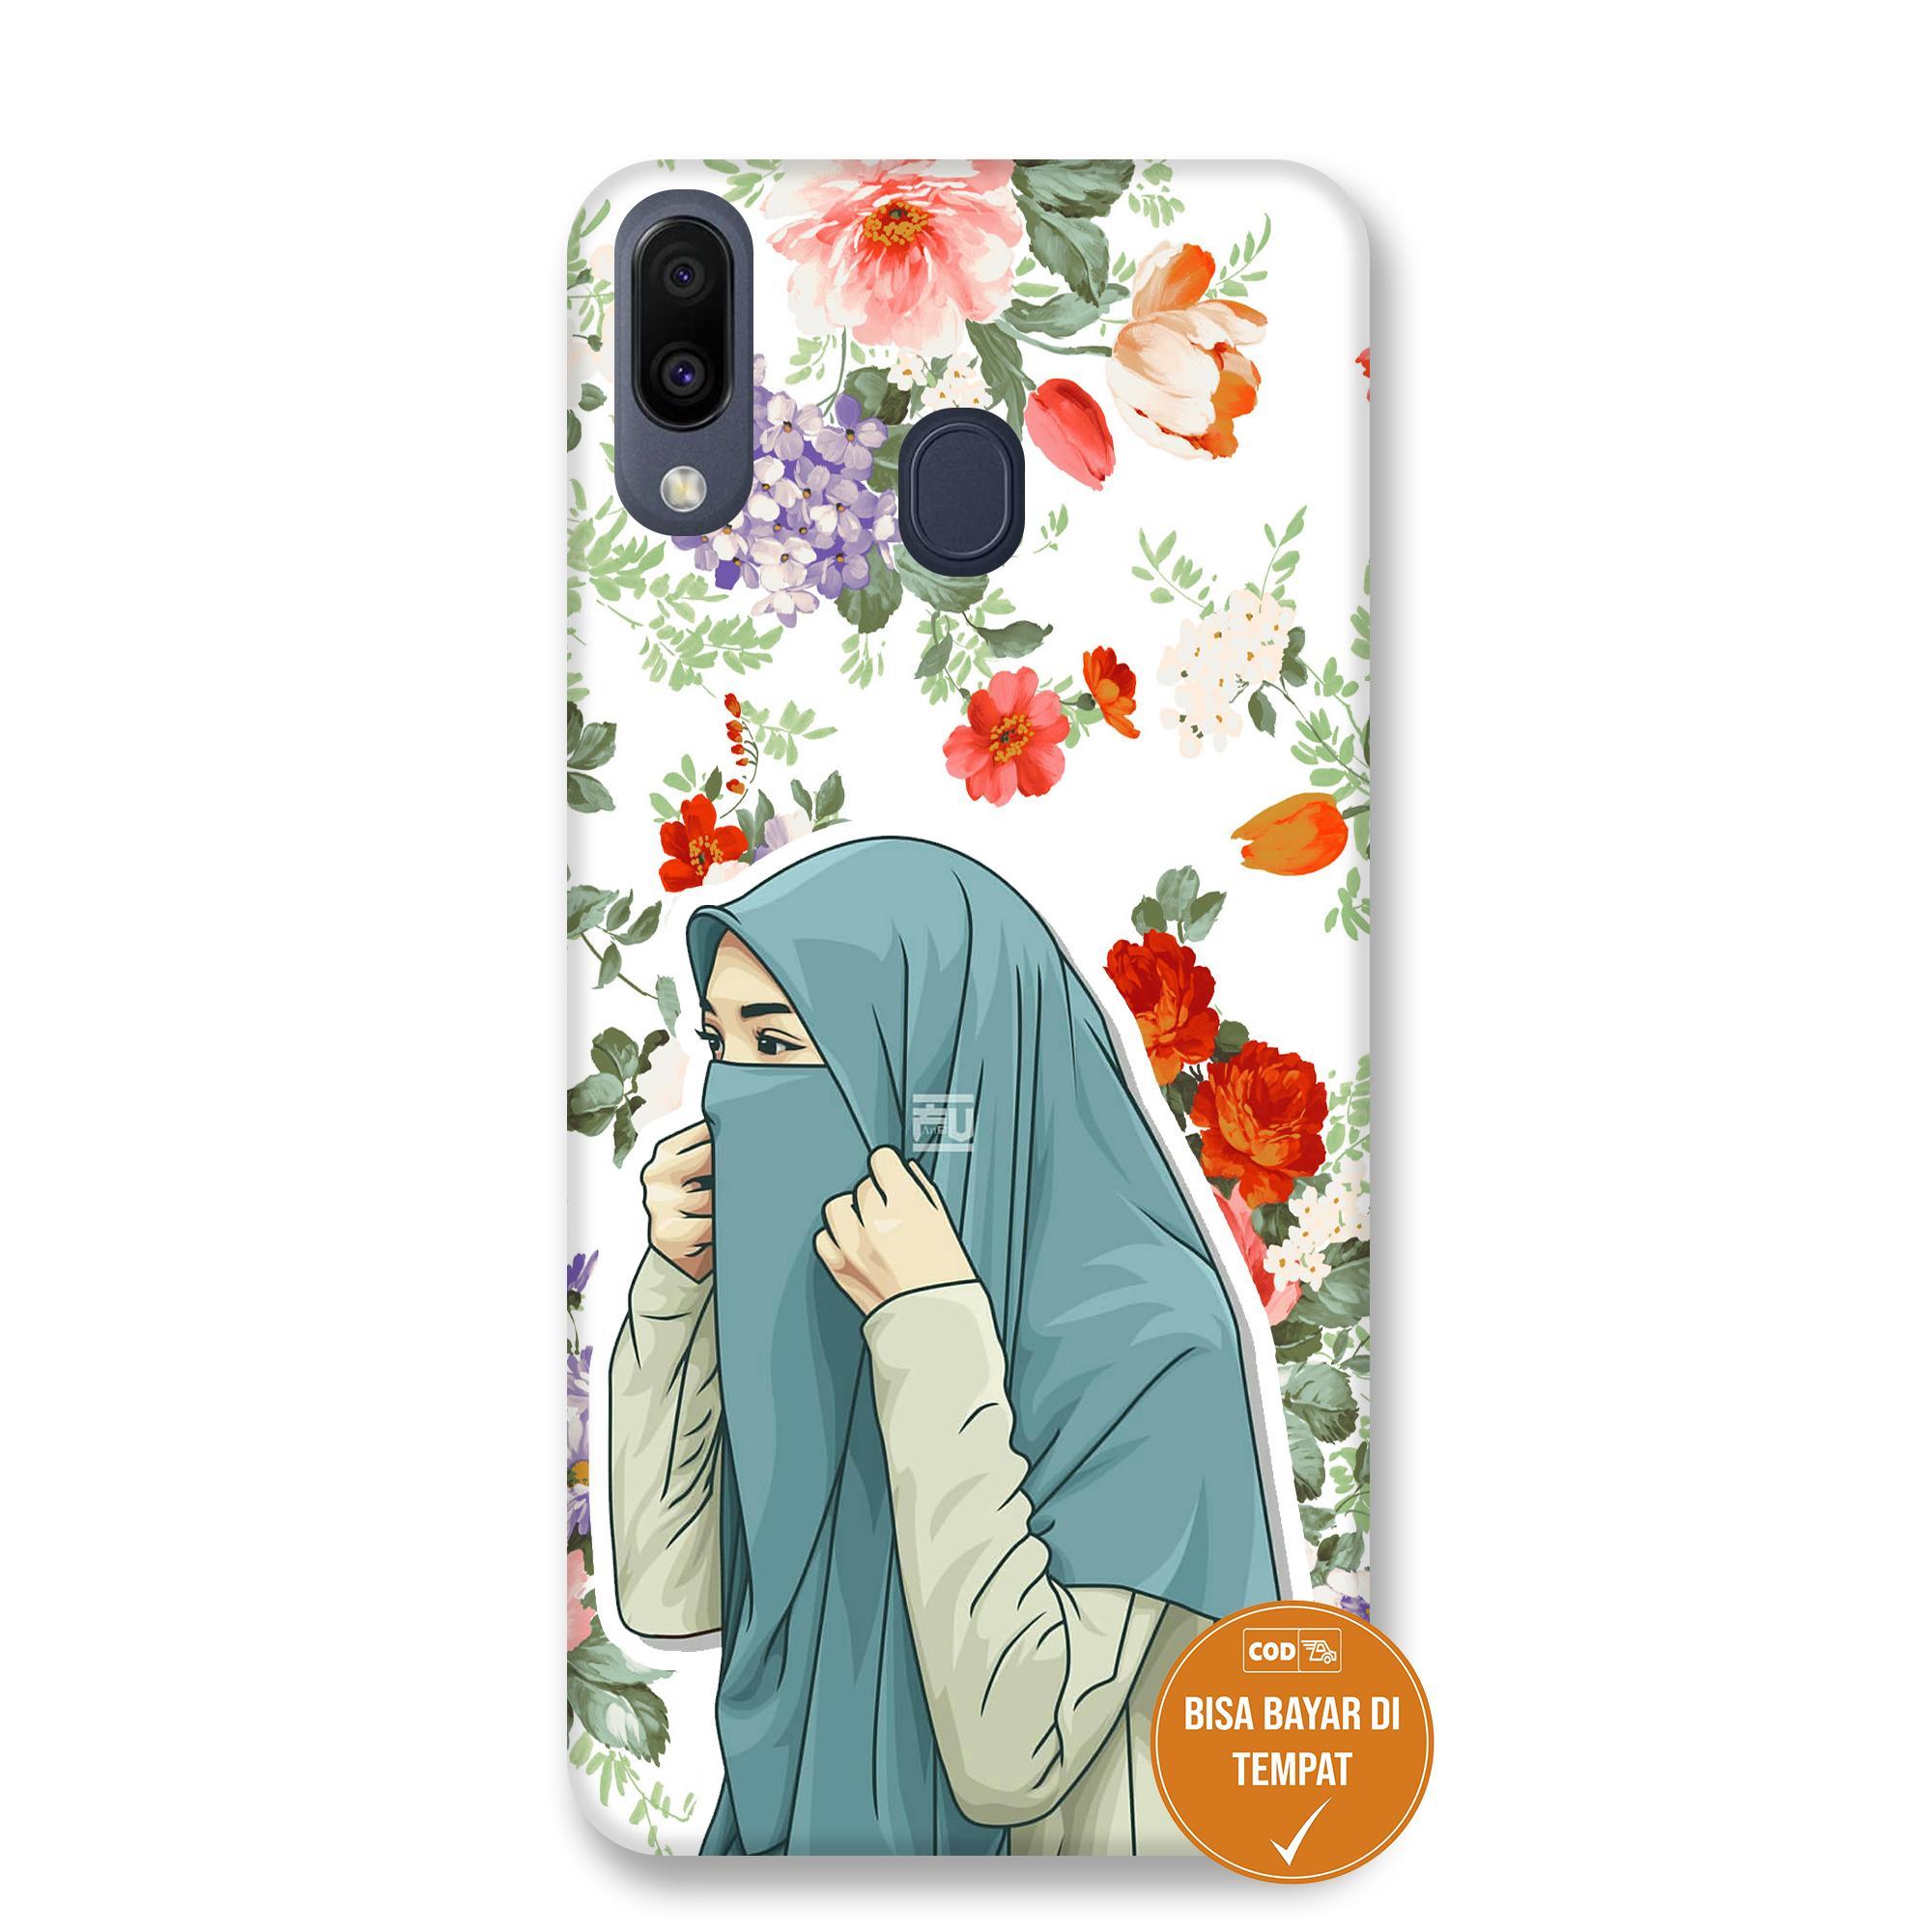 Case Samsung M20 Hijab Flower 1 07 - Marinstore Pelindung Hp, Case Hp, Casing Handphone - BIsa COD/ Bayar DItempat paling murah paling bagus